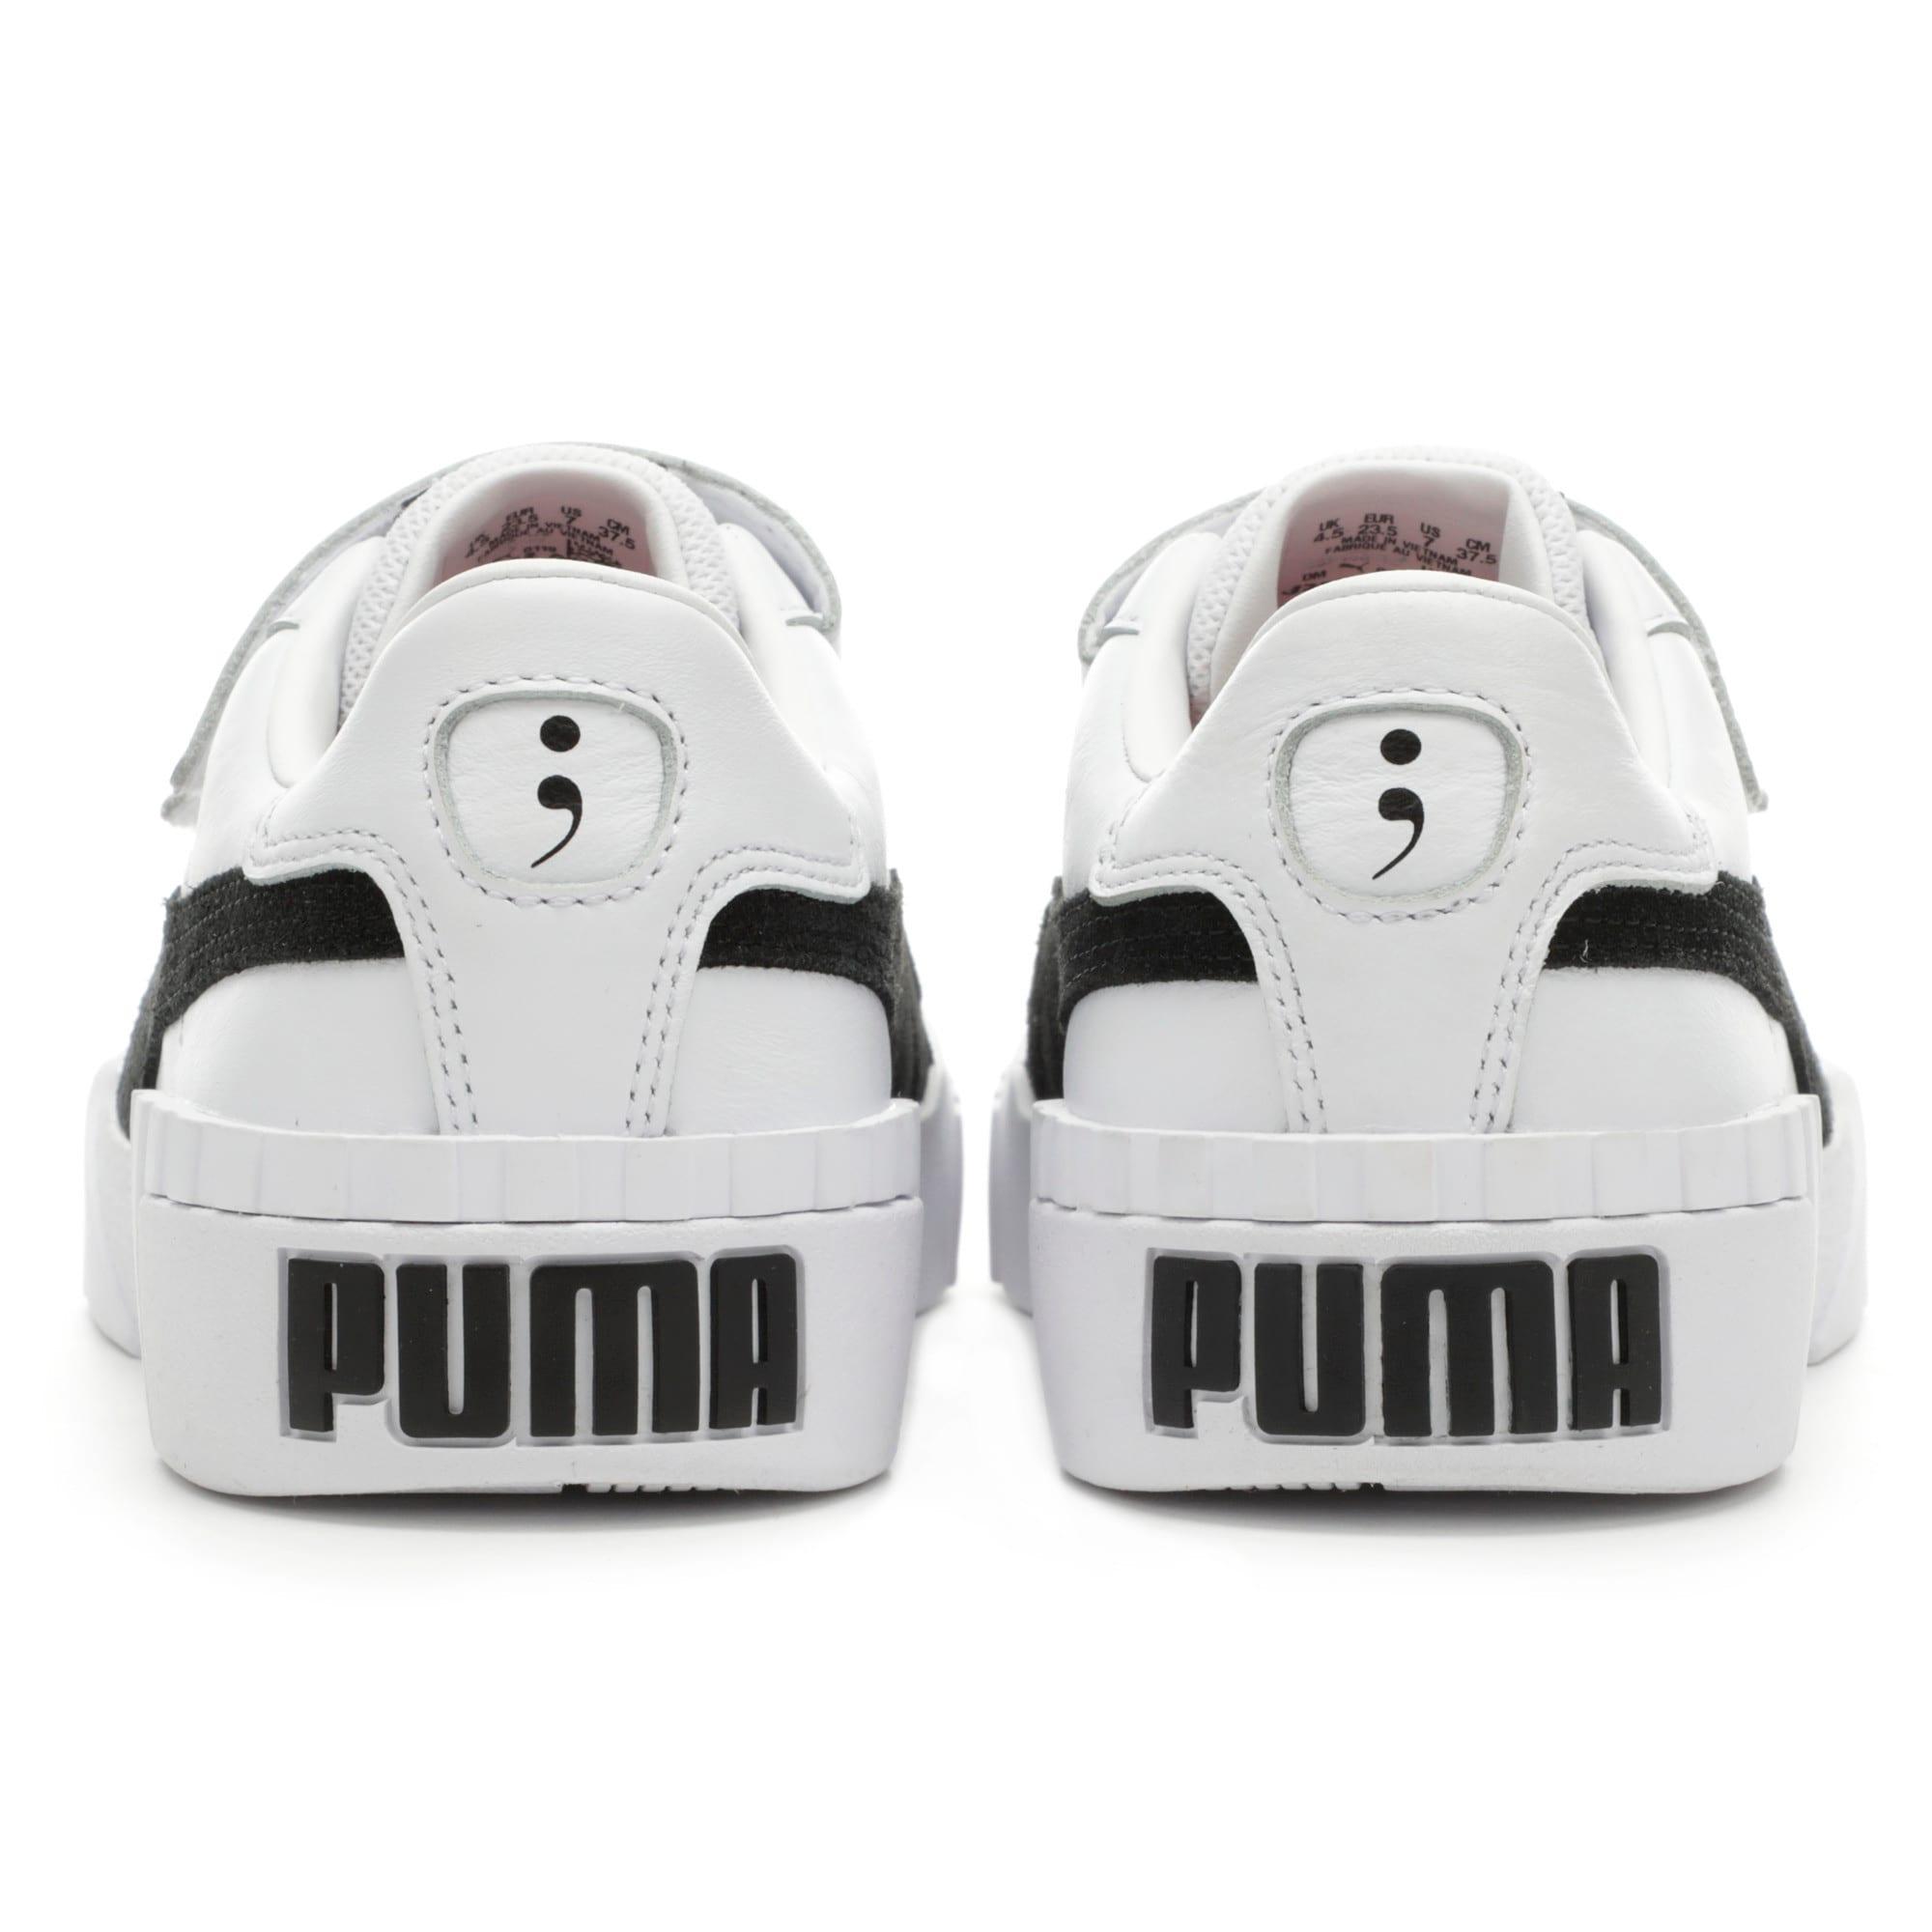 Thumbnail 4 of SG x Cali B+W Women's Sneakers, Puma White-Puma Black, medium